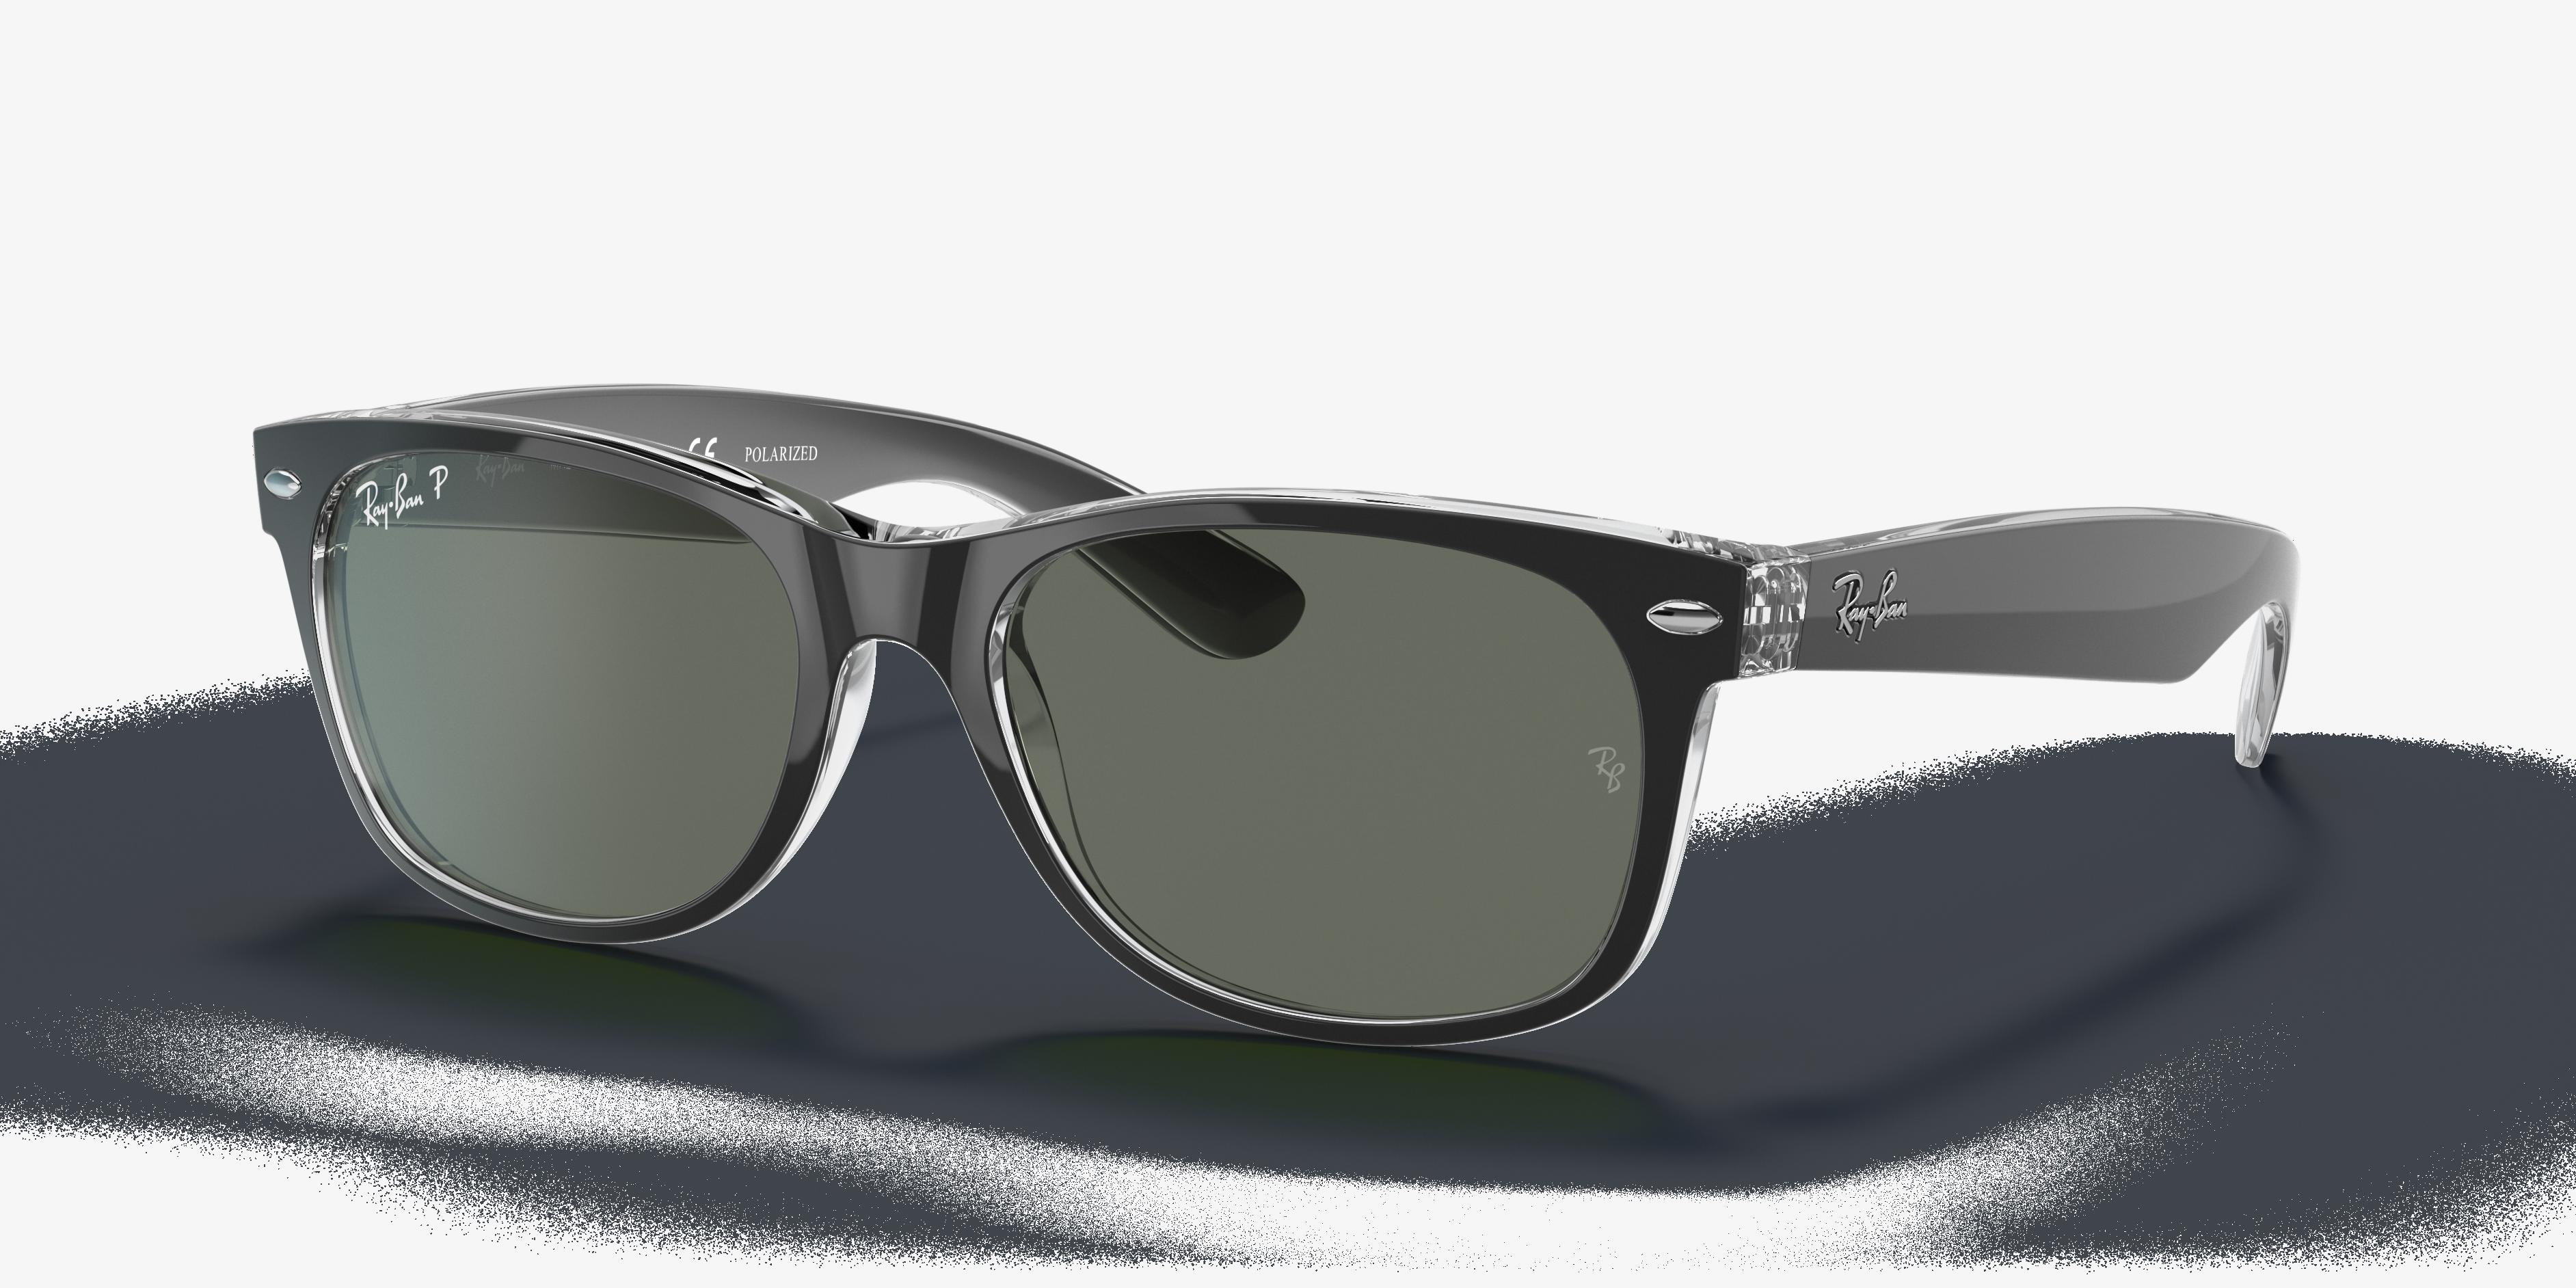 Ray-Ban New Wayfarer Classic Black, Polarized Green Lenses - RB2132